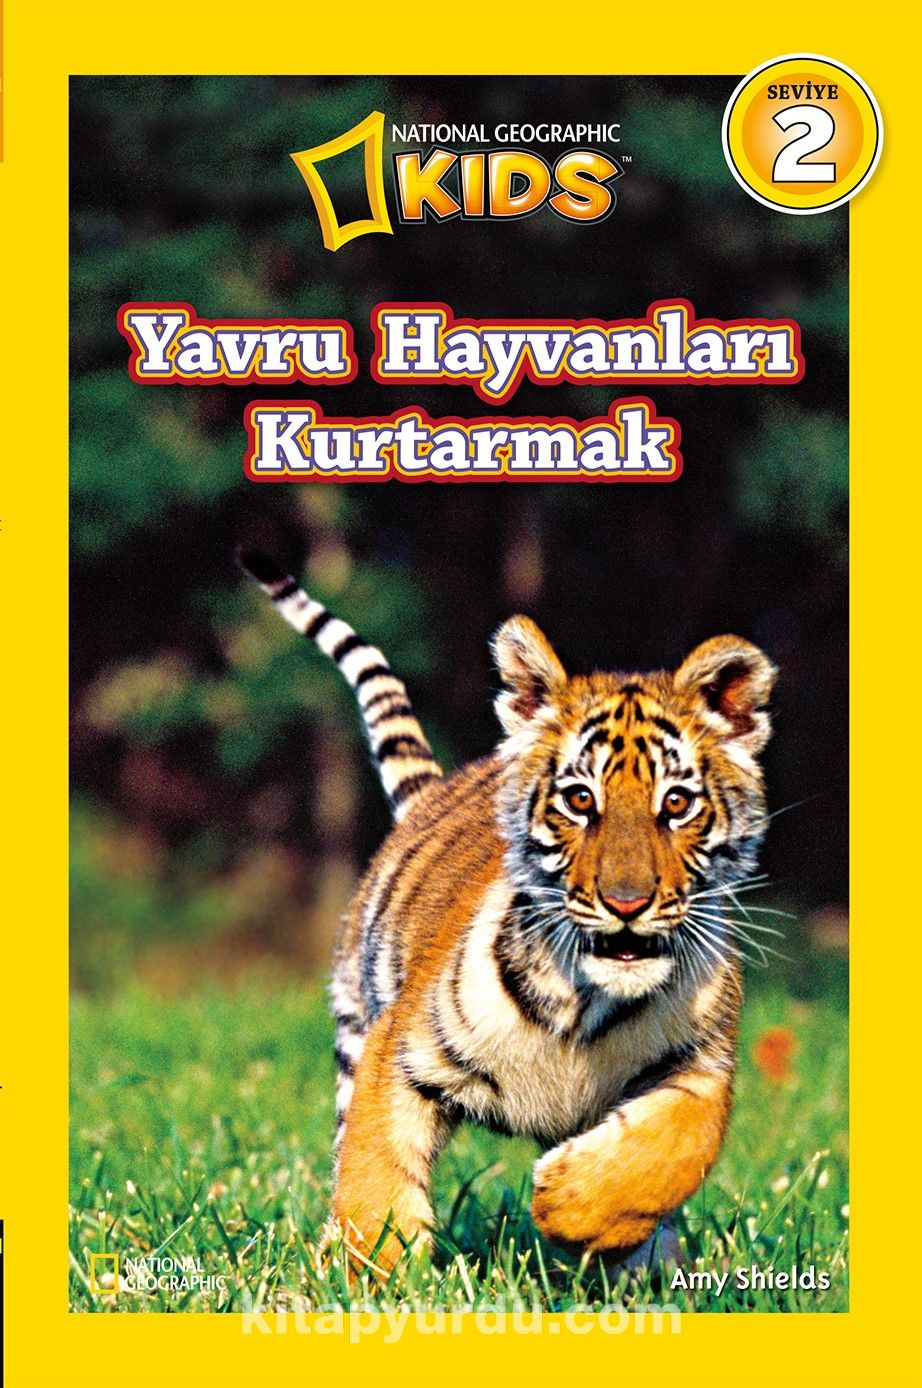 National Geographic Kids Yavru Hayvanları Kurtarmak - Amy Shields pdf epub